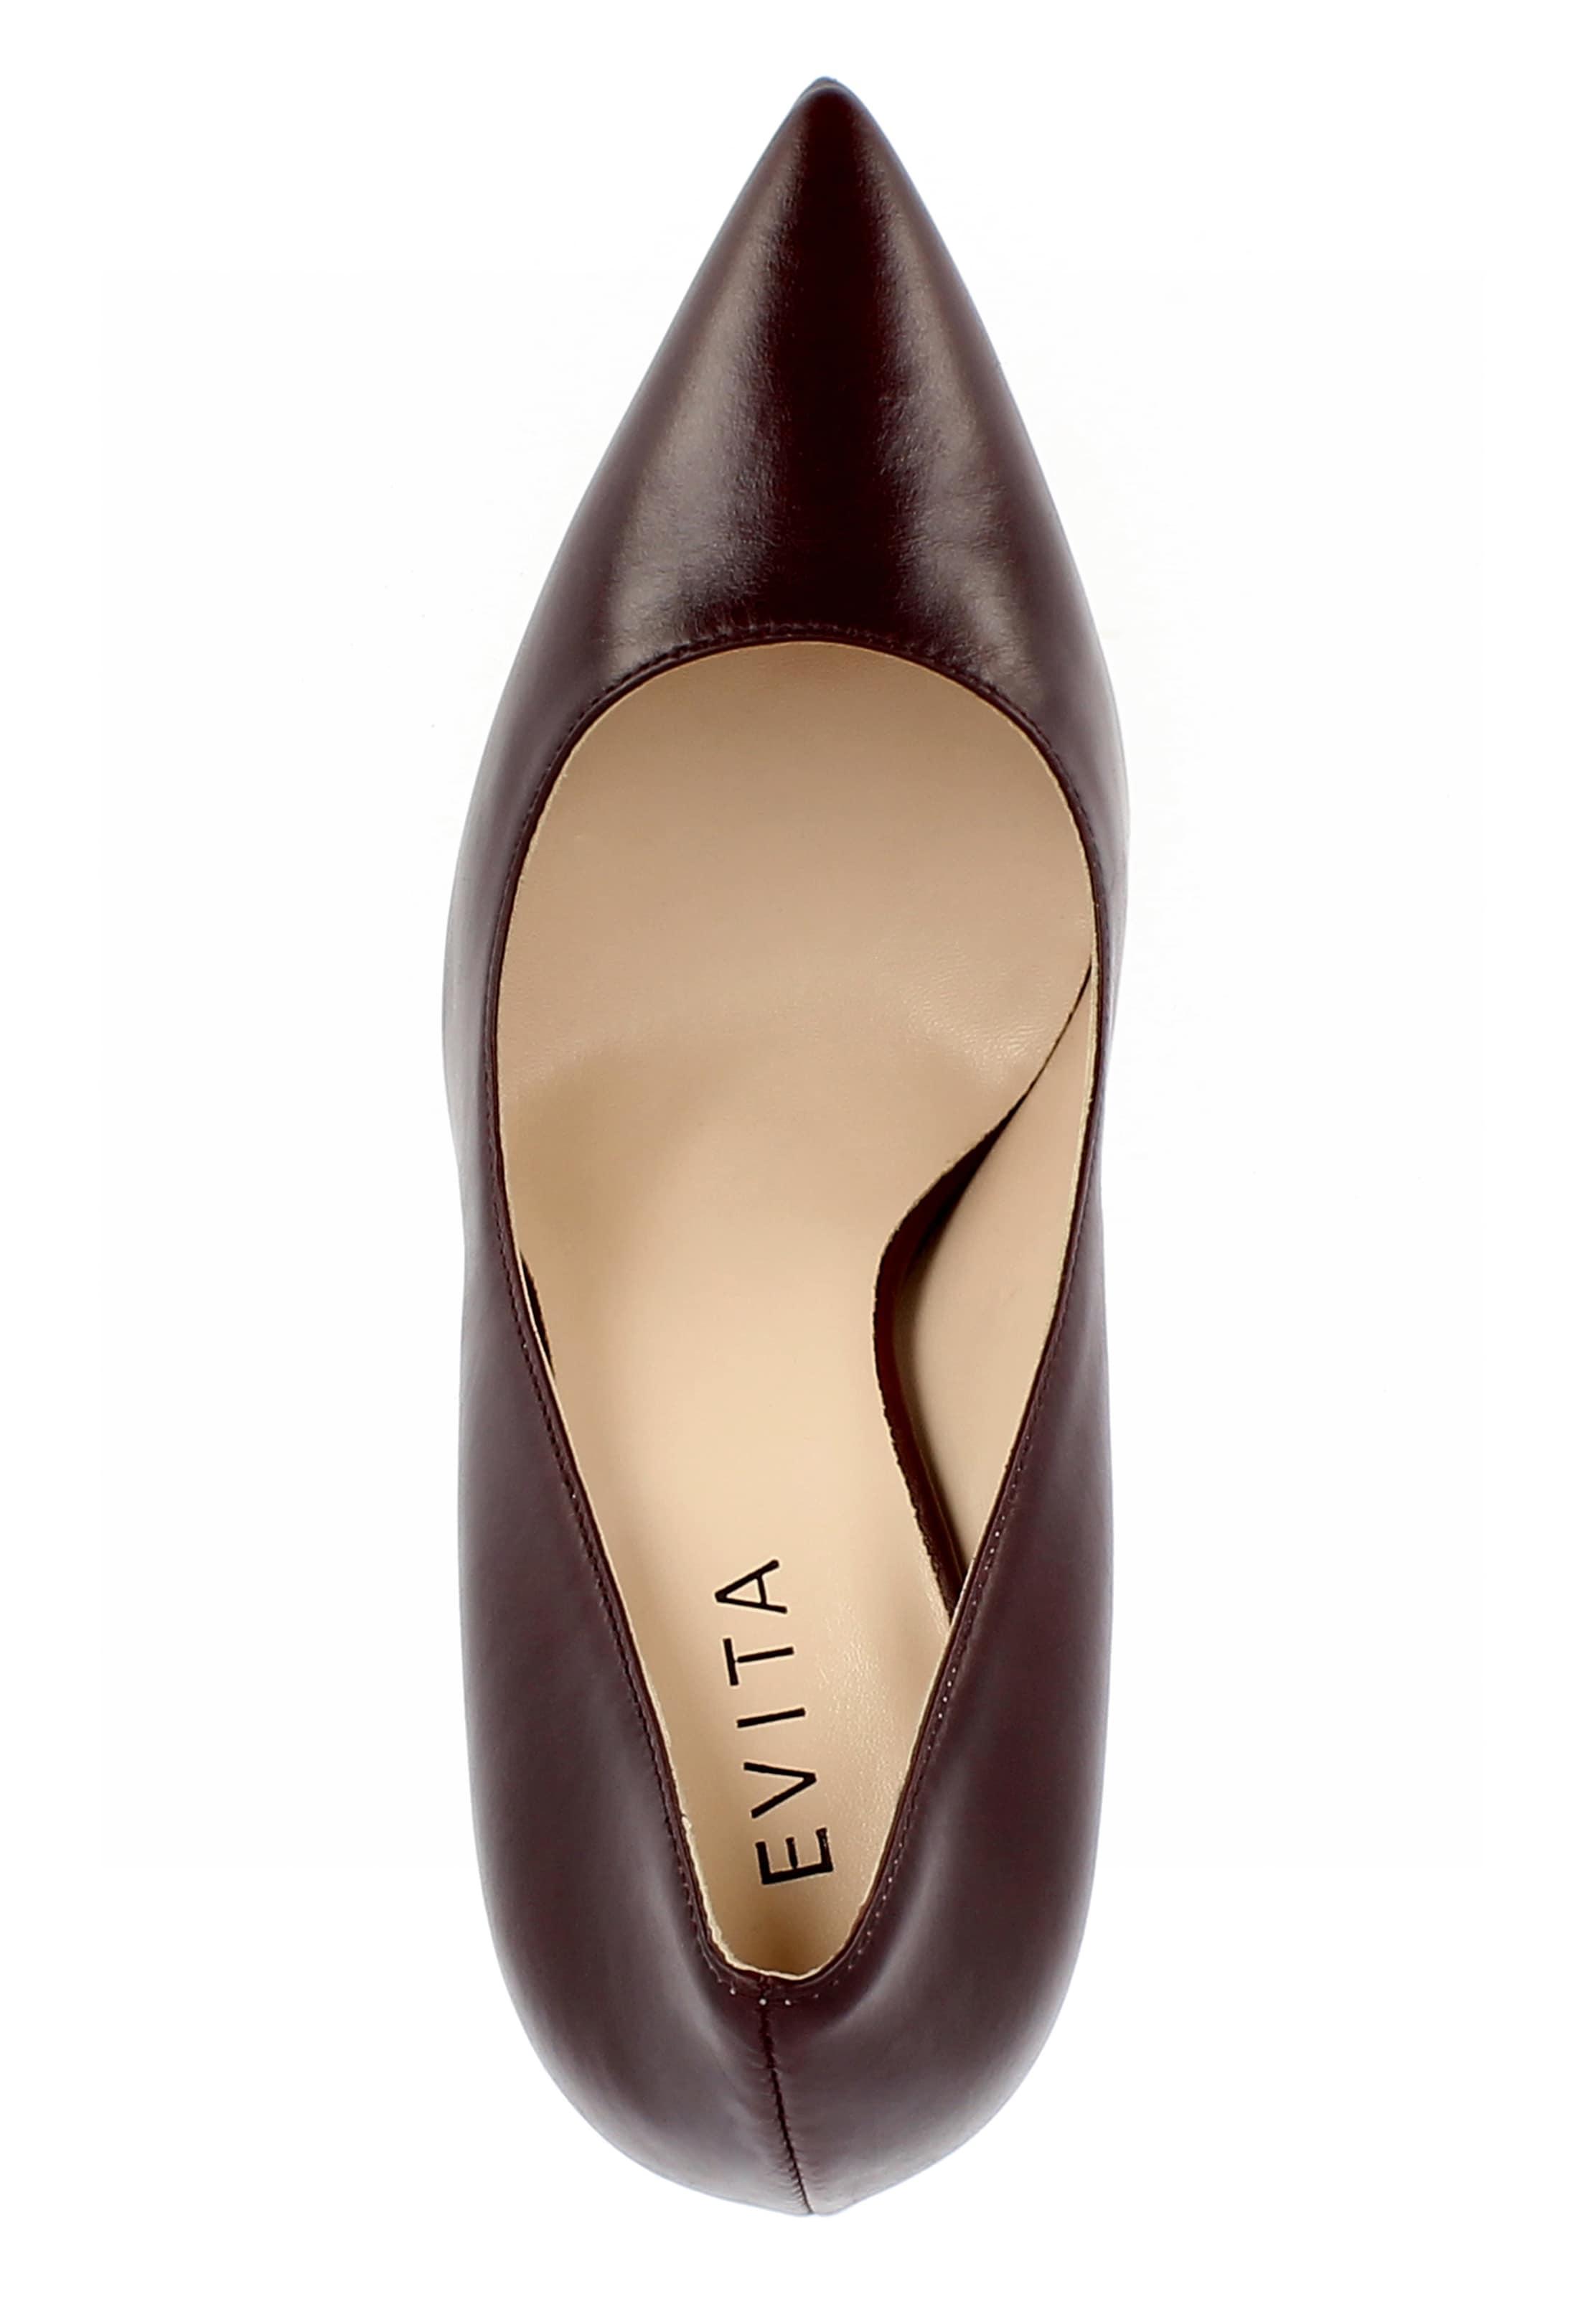 Bordeaux Evita Evita 'alina' In Evita Pumps Pumps 'alina' 'alina' Bordeaux Pumps In Nym0wPnOv8